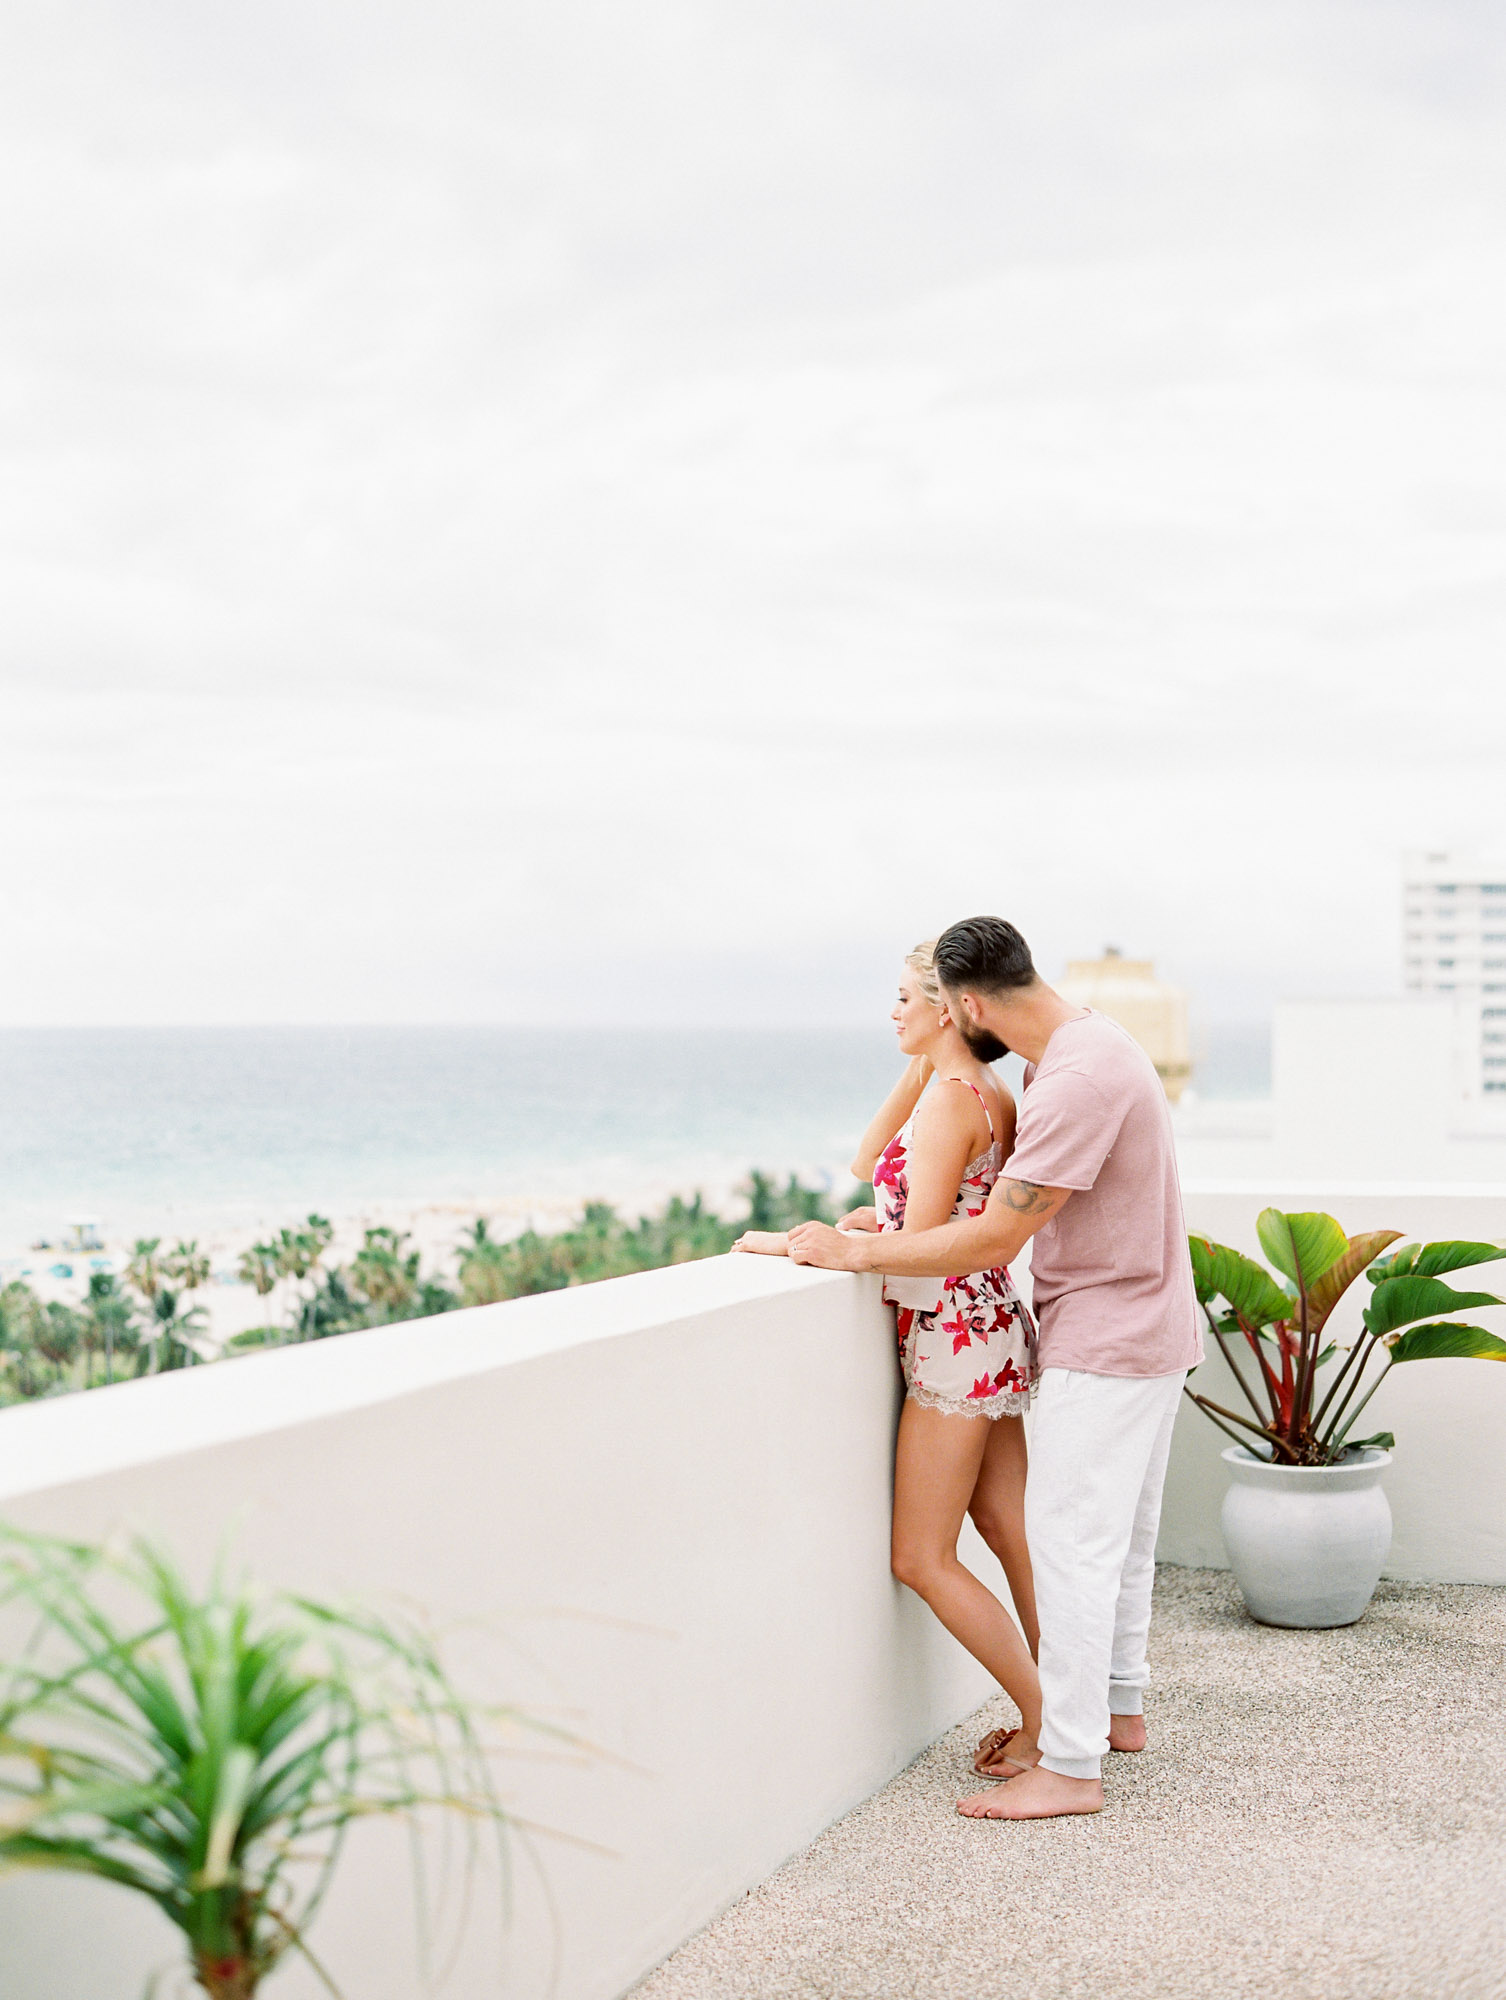 raleigh-miami-beach-destination-film-wedding-2-17.jpg